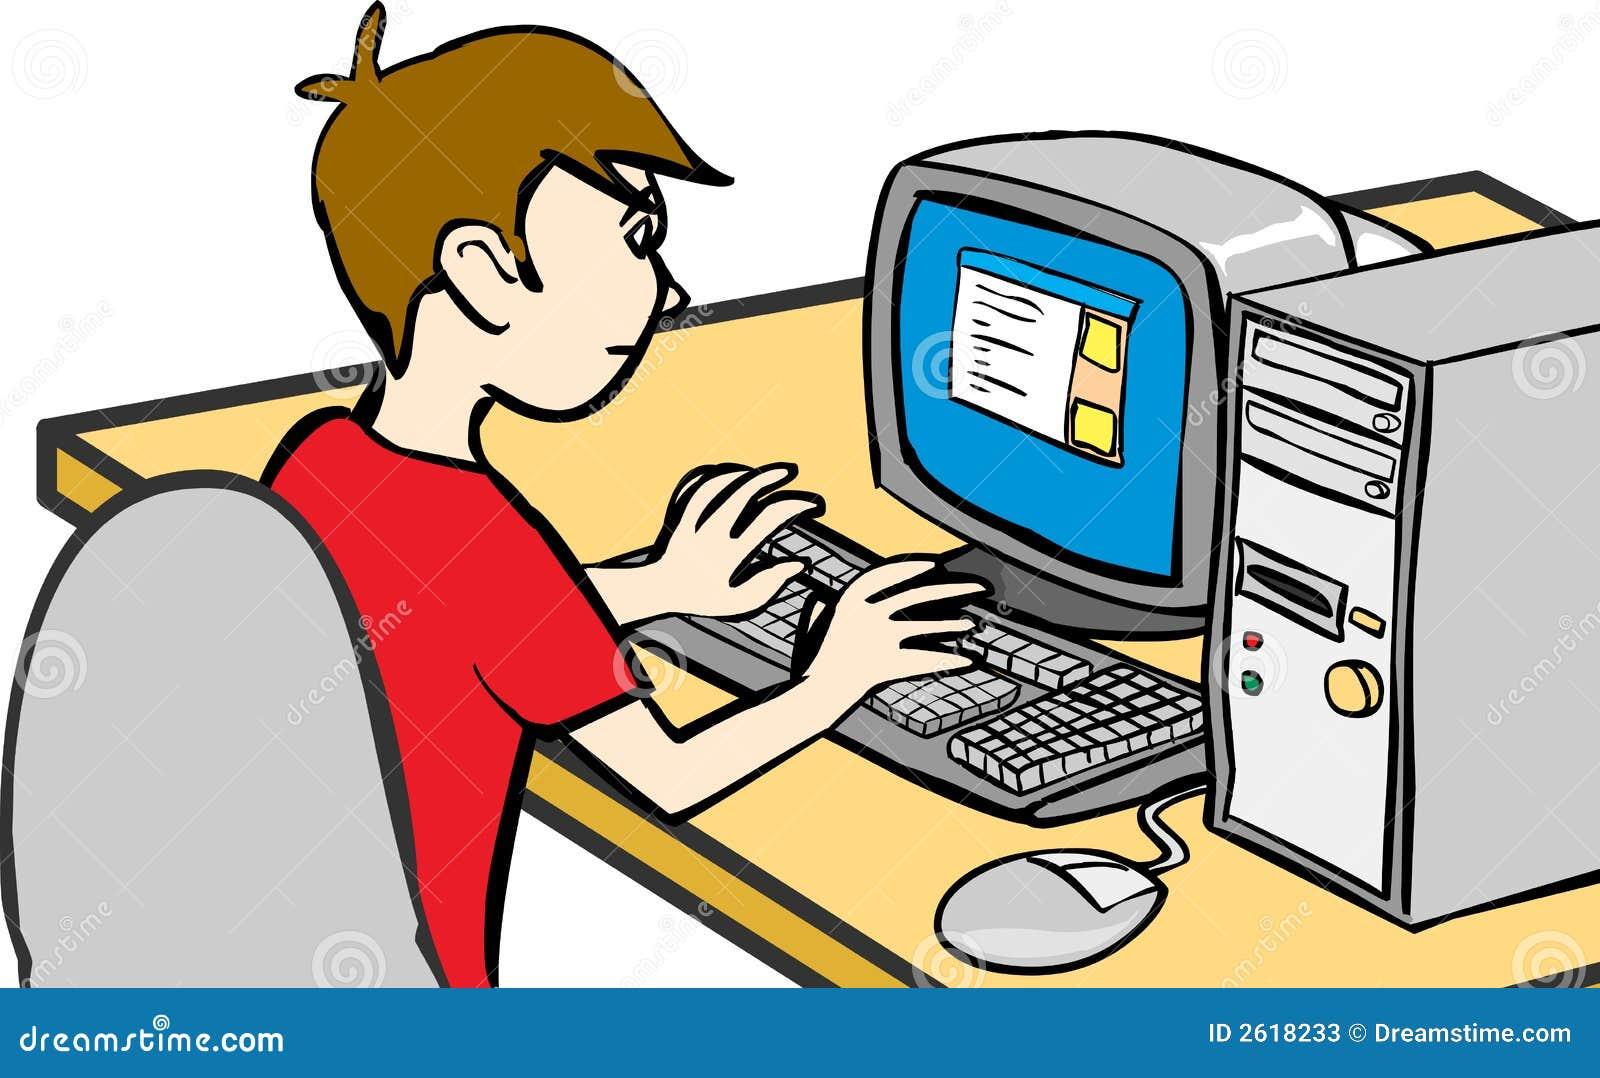 computer work clipart - photo #11